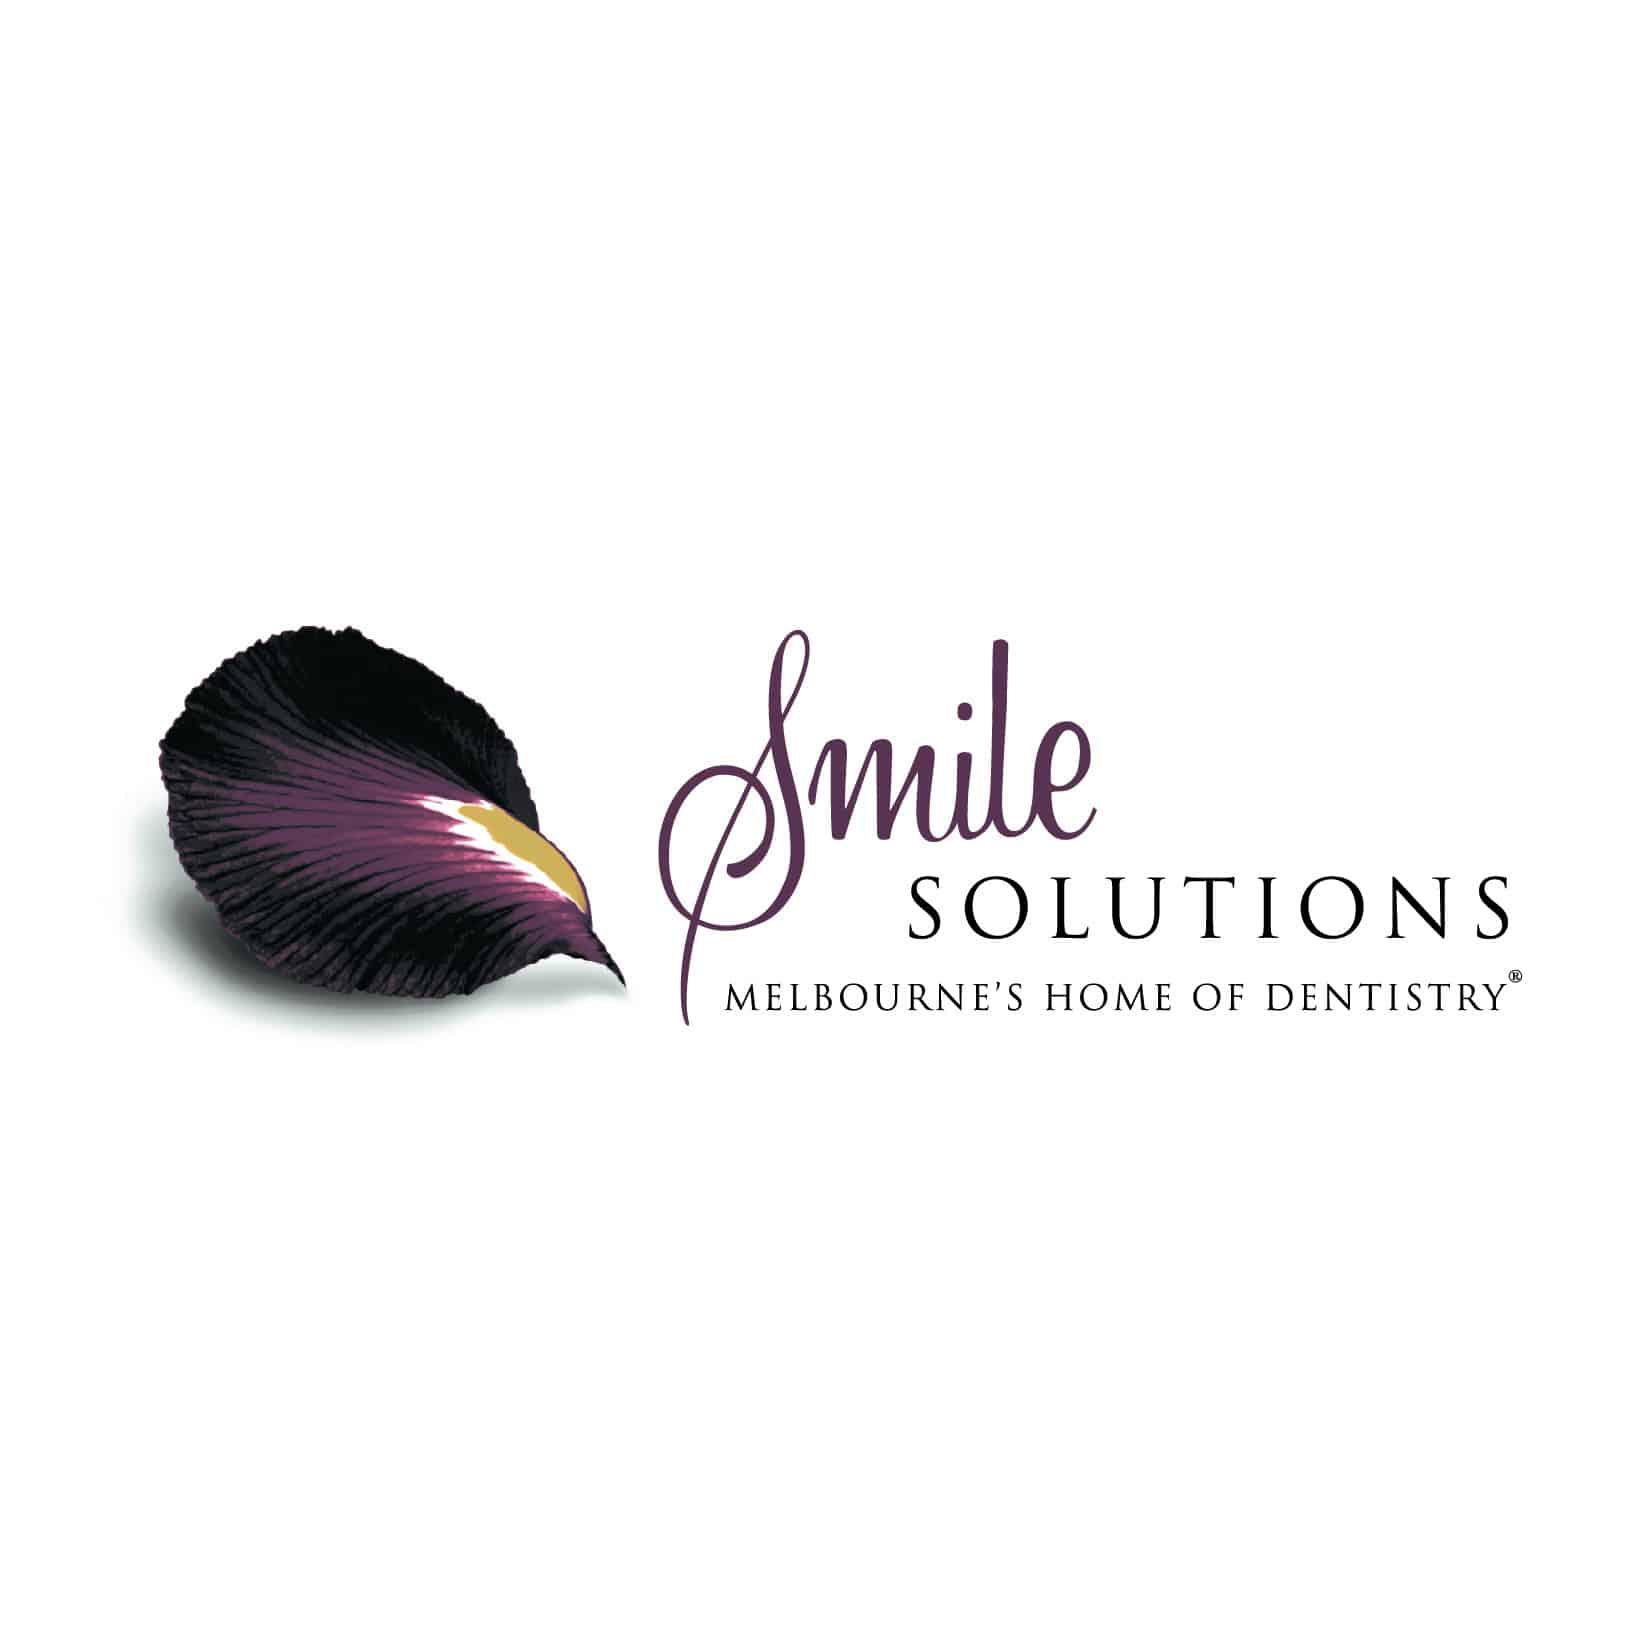 Dentist Melbourne | Melbourne CBD Dental Clinic | Smile Solutions